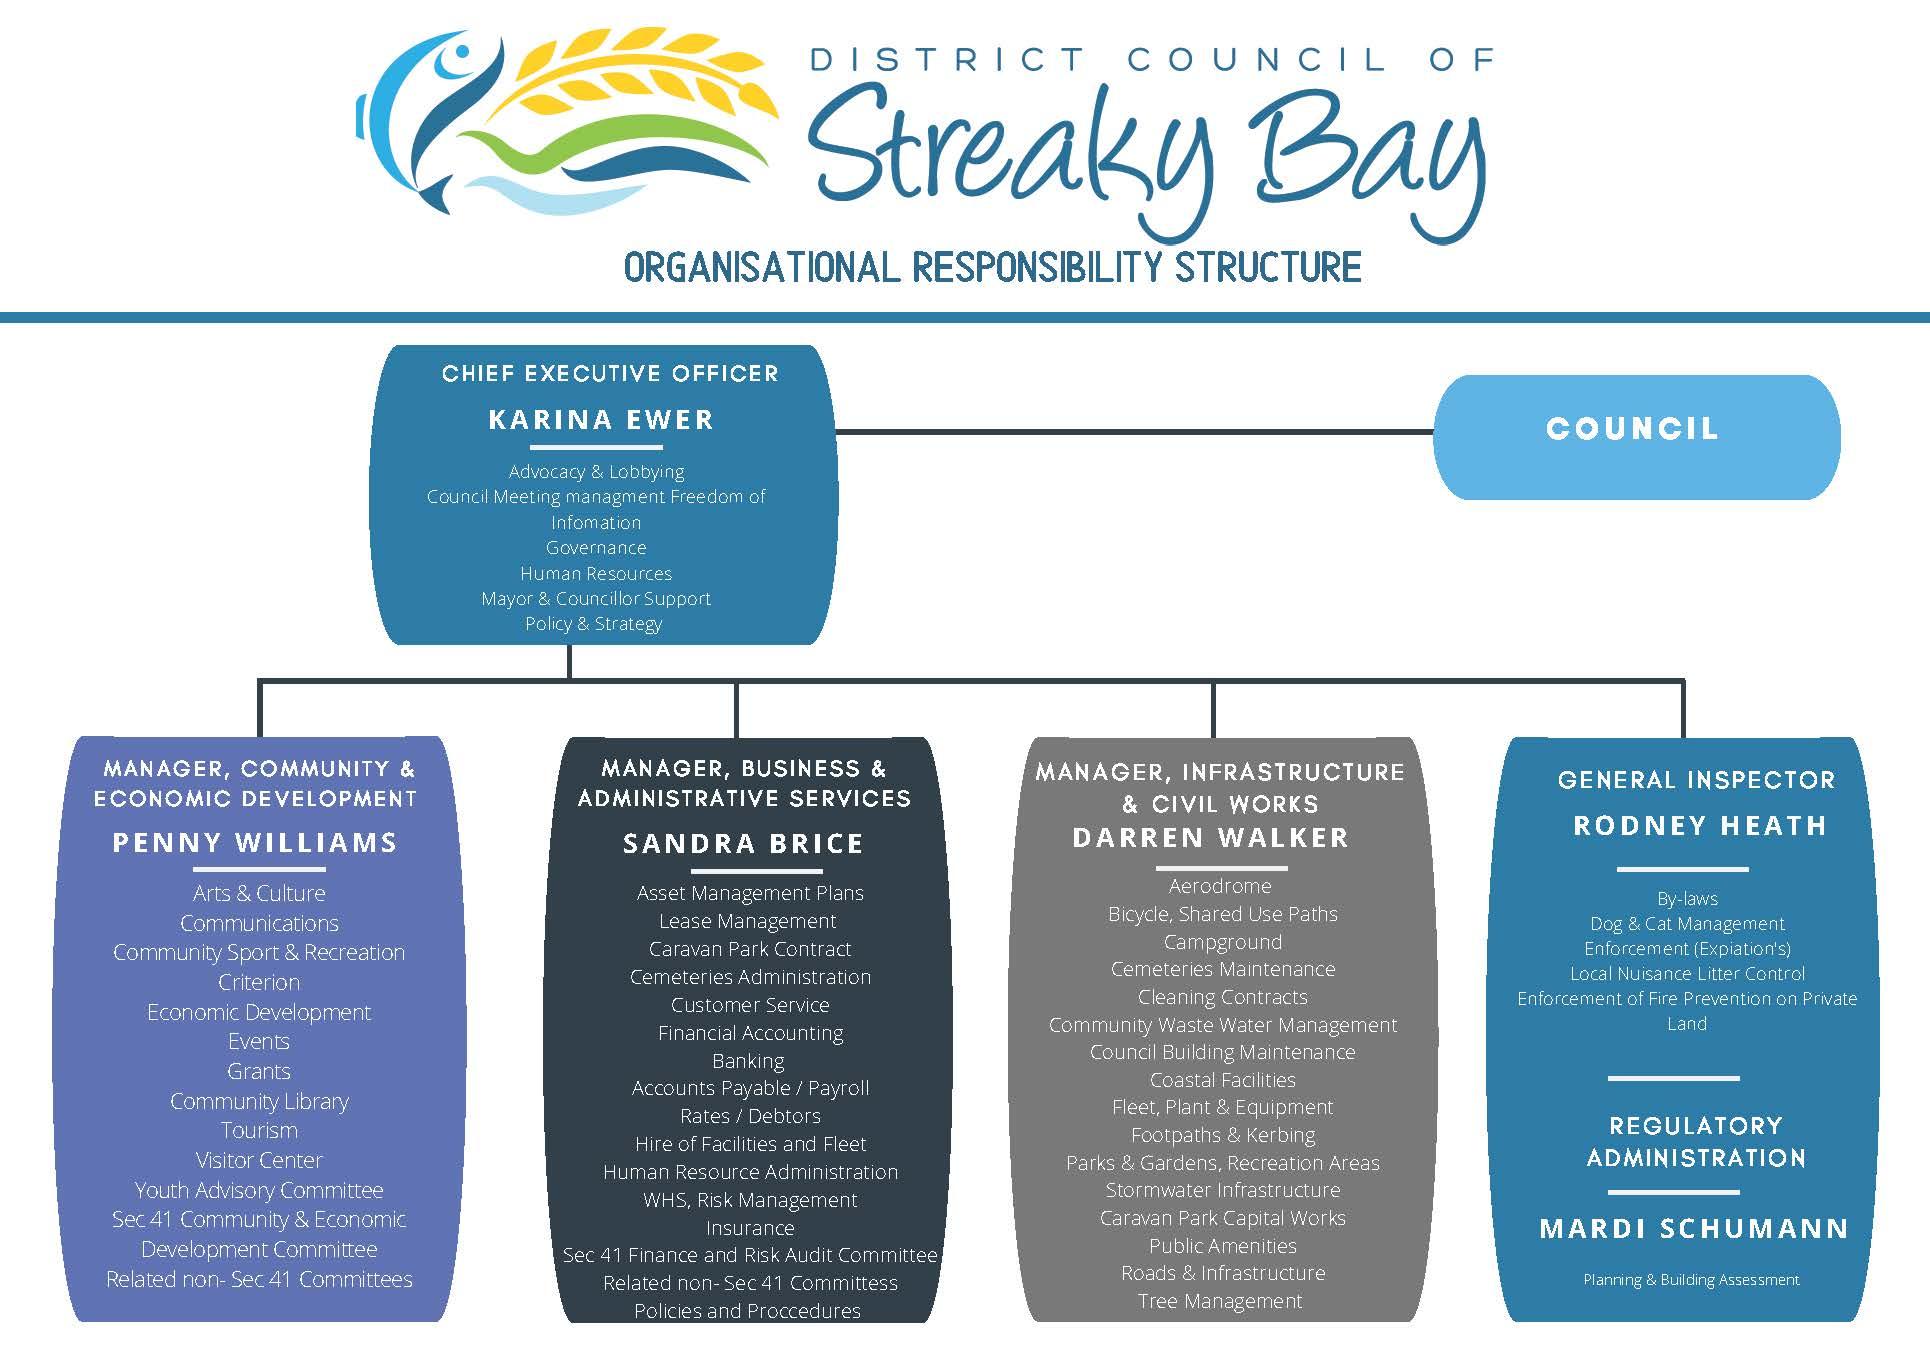 Council Responsible Areas